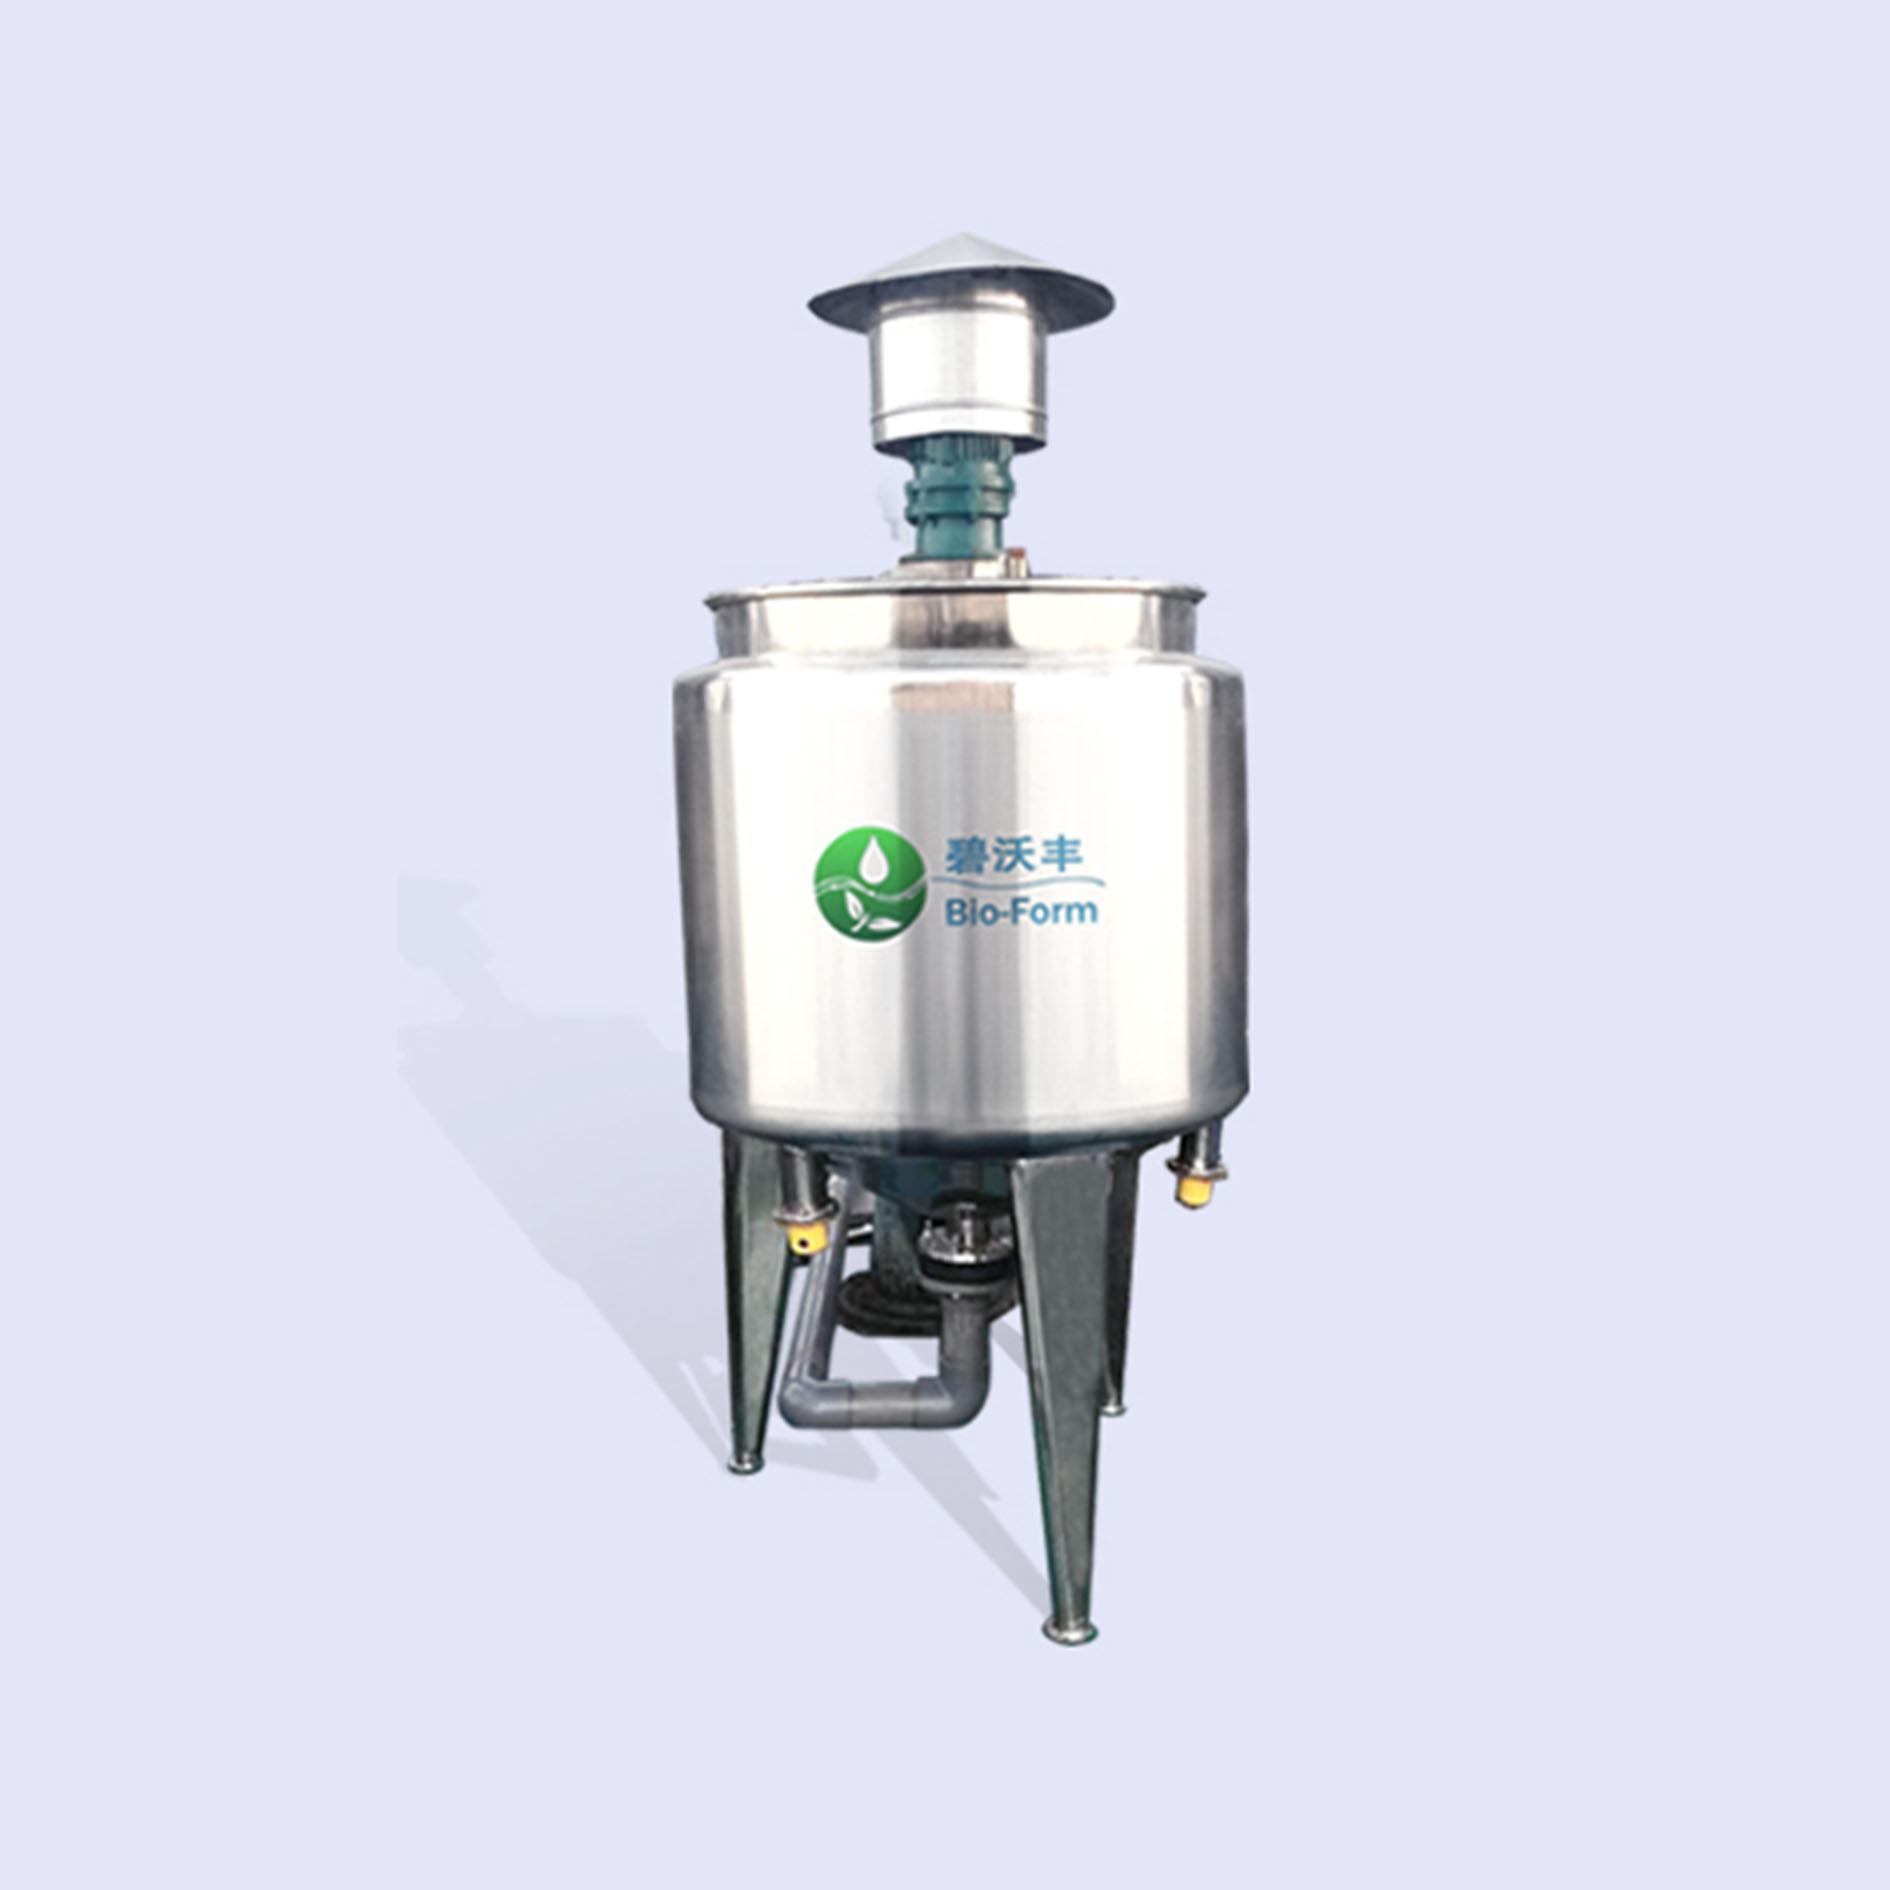 Bio-Form Microbial Incubator